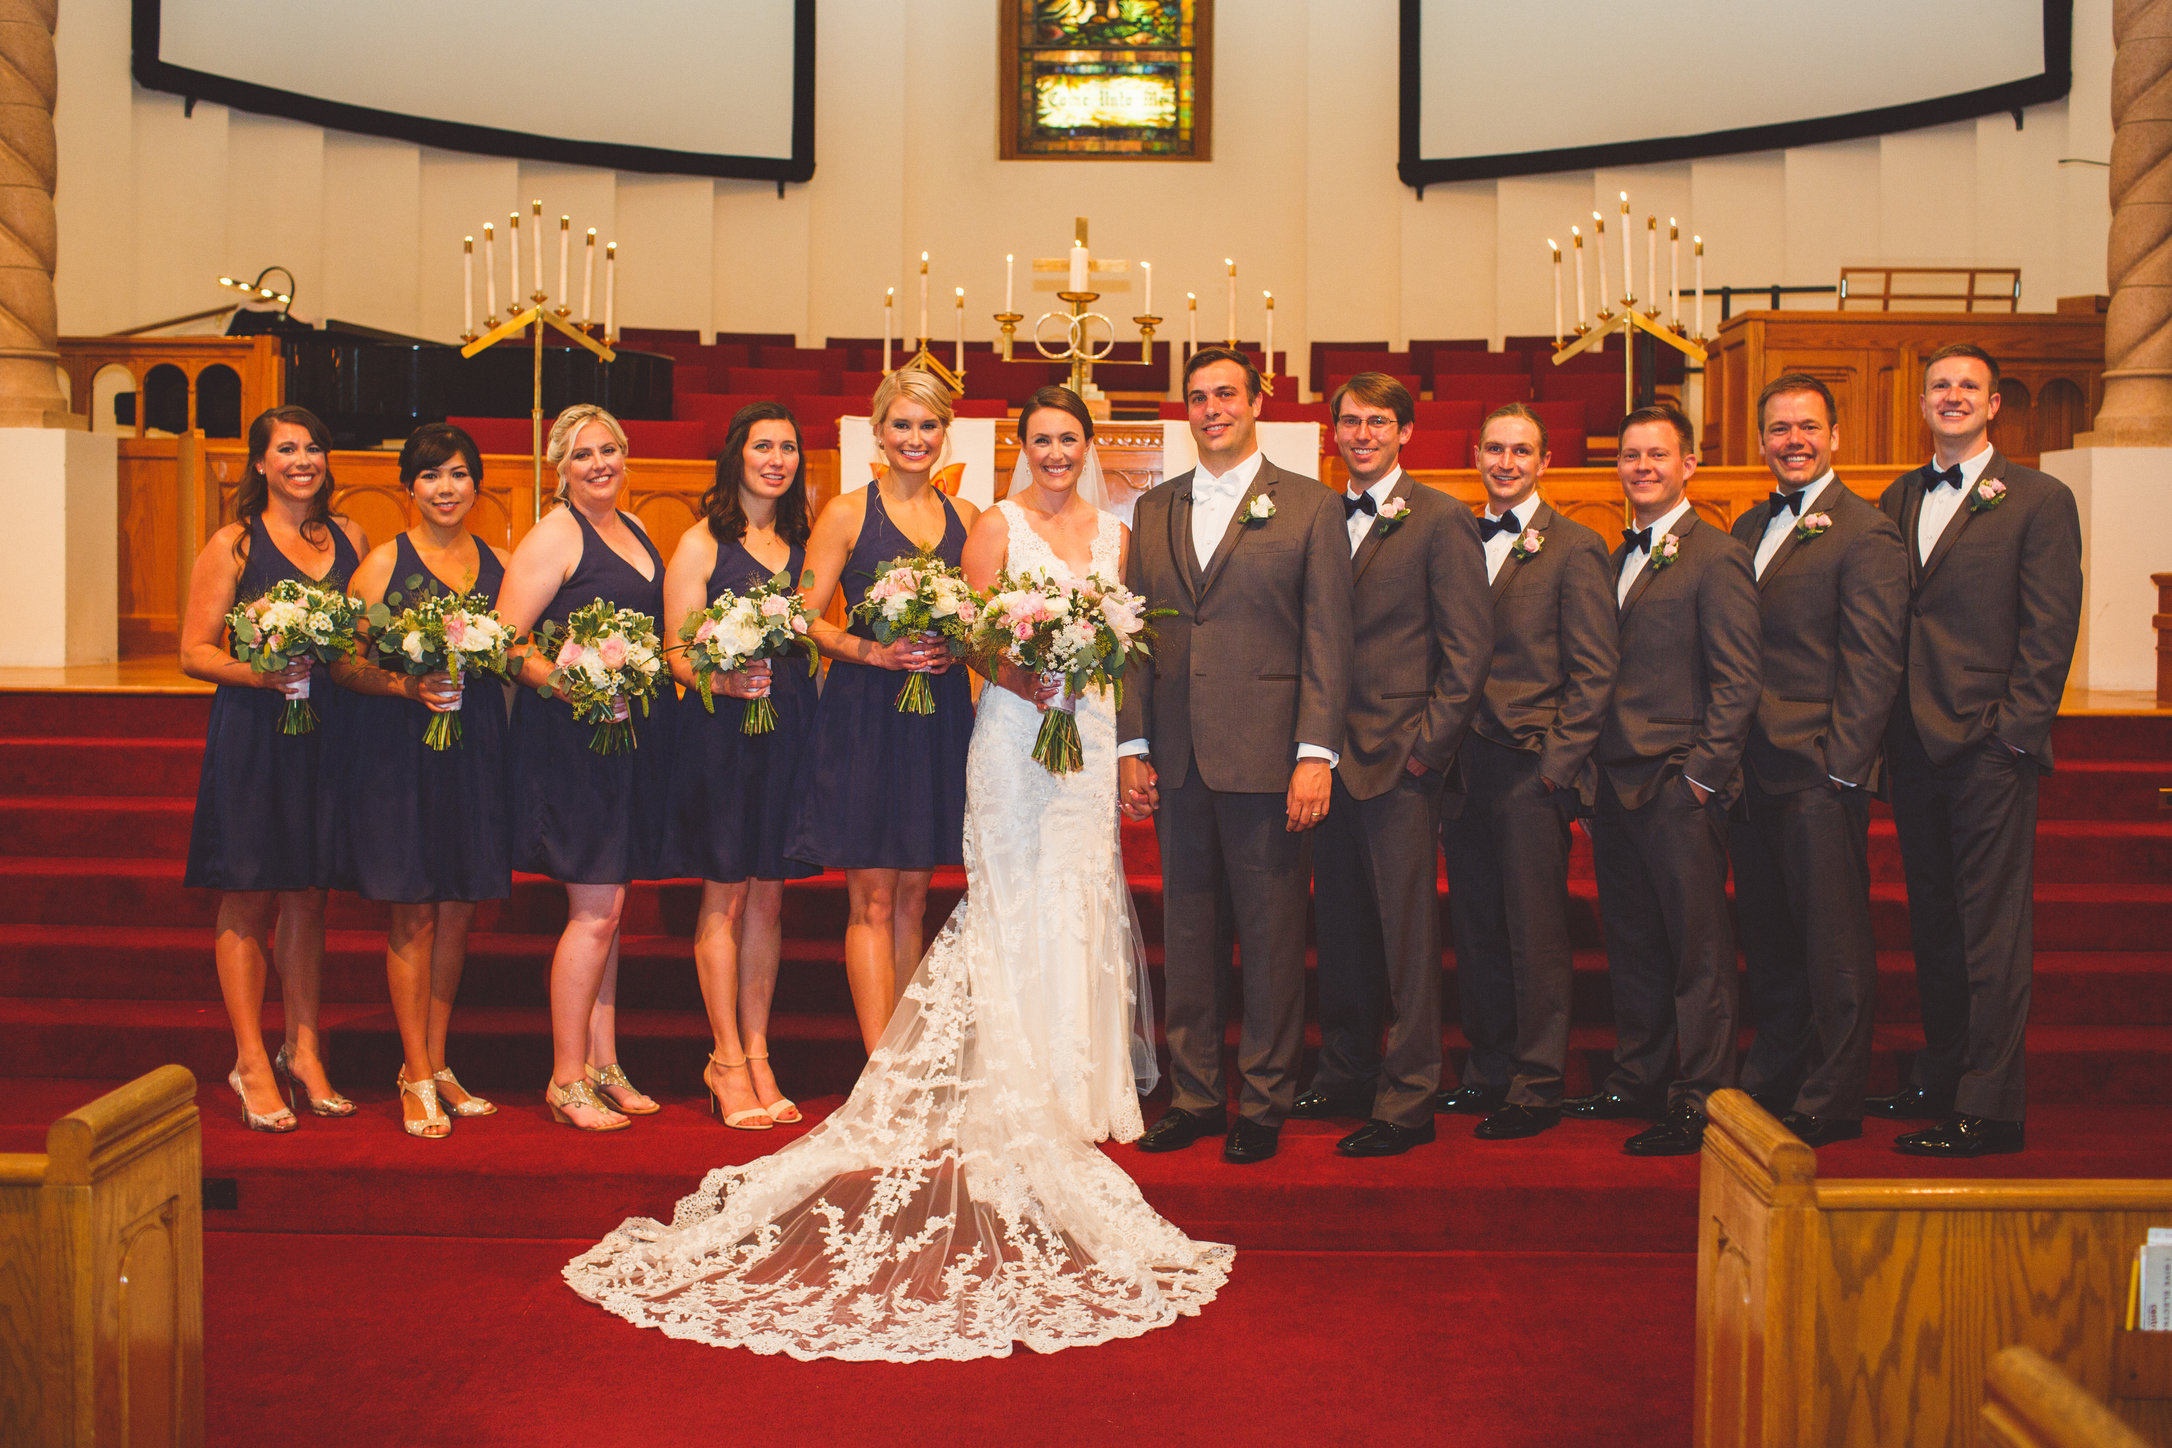 SandC-wedding-251.jpg